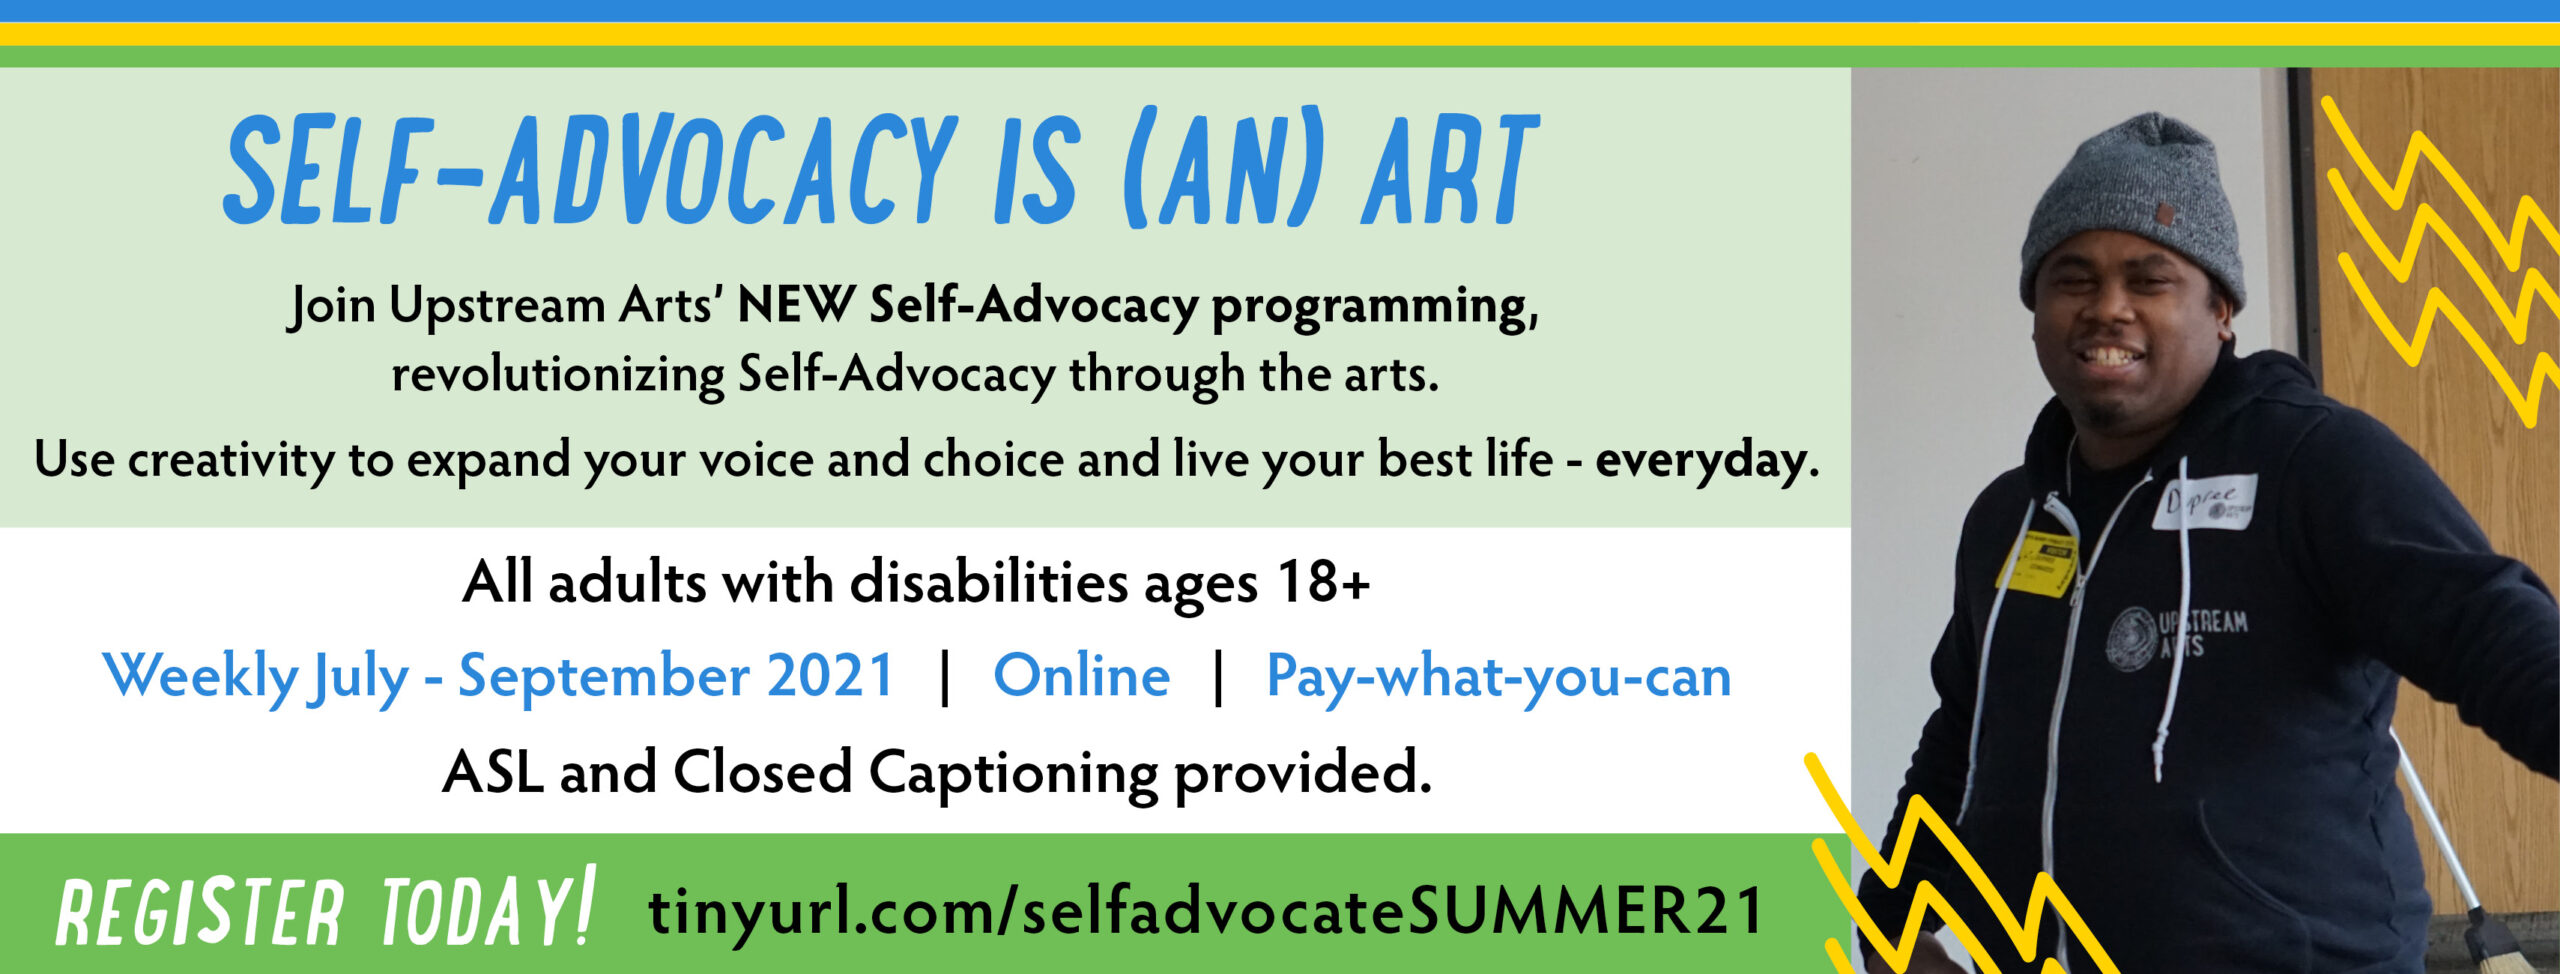 Self-Advocacy banner